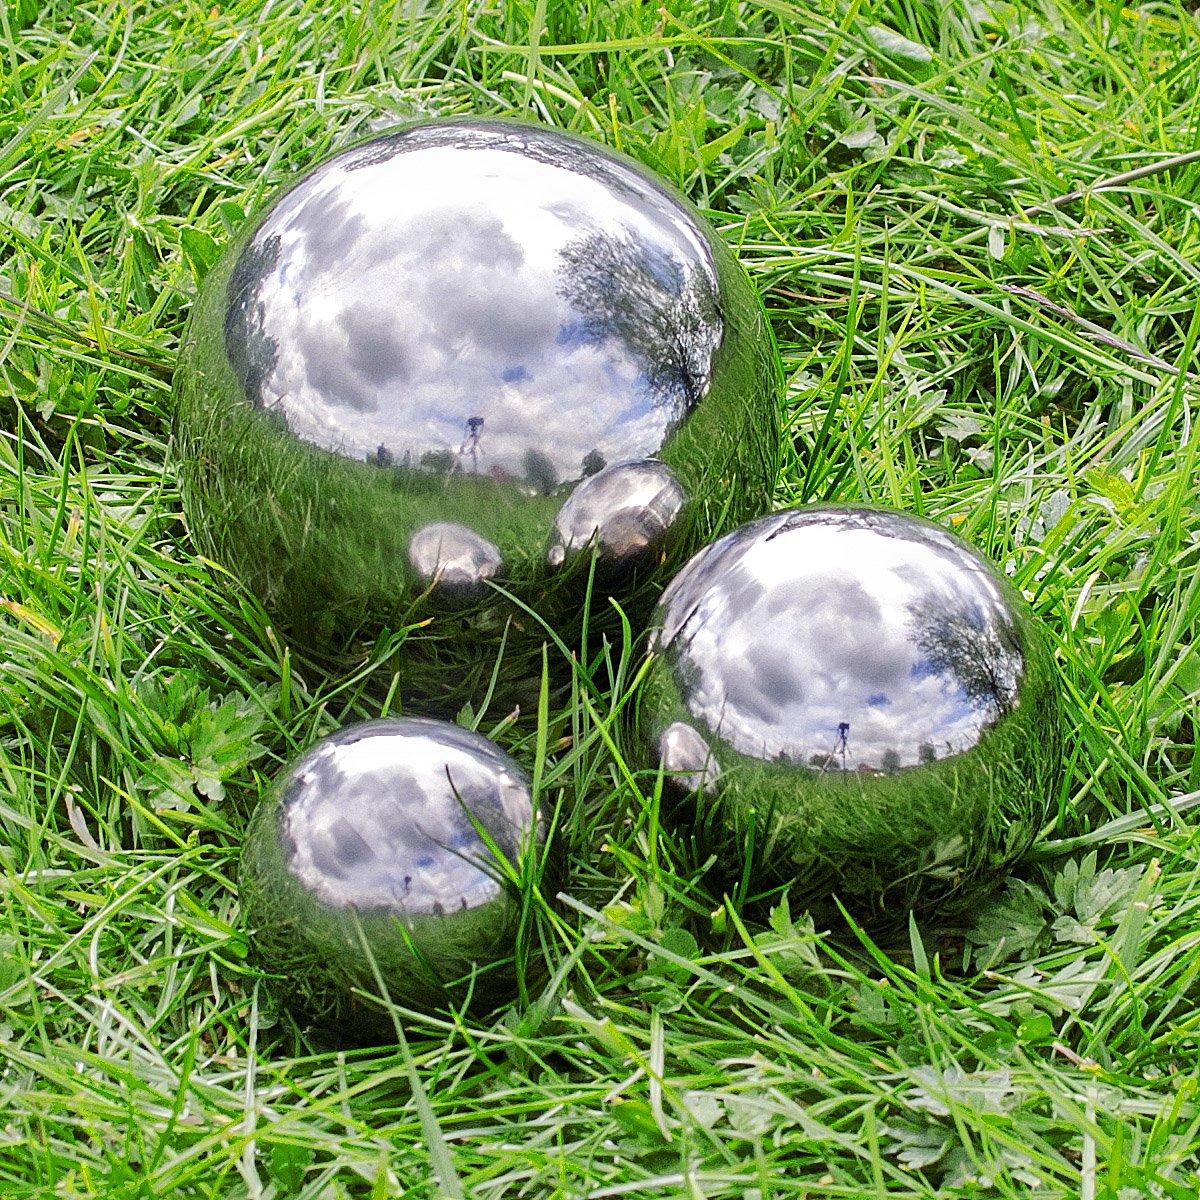 di/ámetro 40 cm Altura 37 cm hydroflora 63003420 Esfera Decorativa Nicoli EOS Antracita Mate